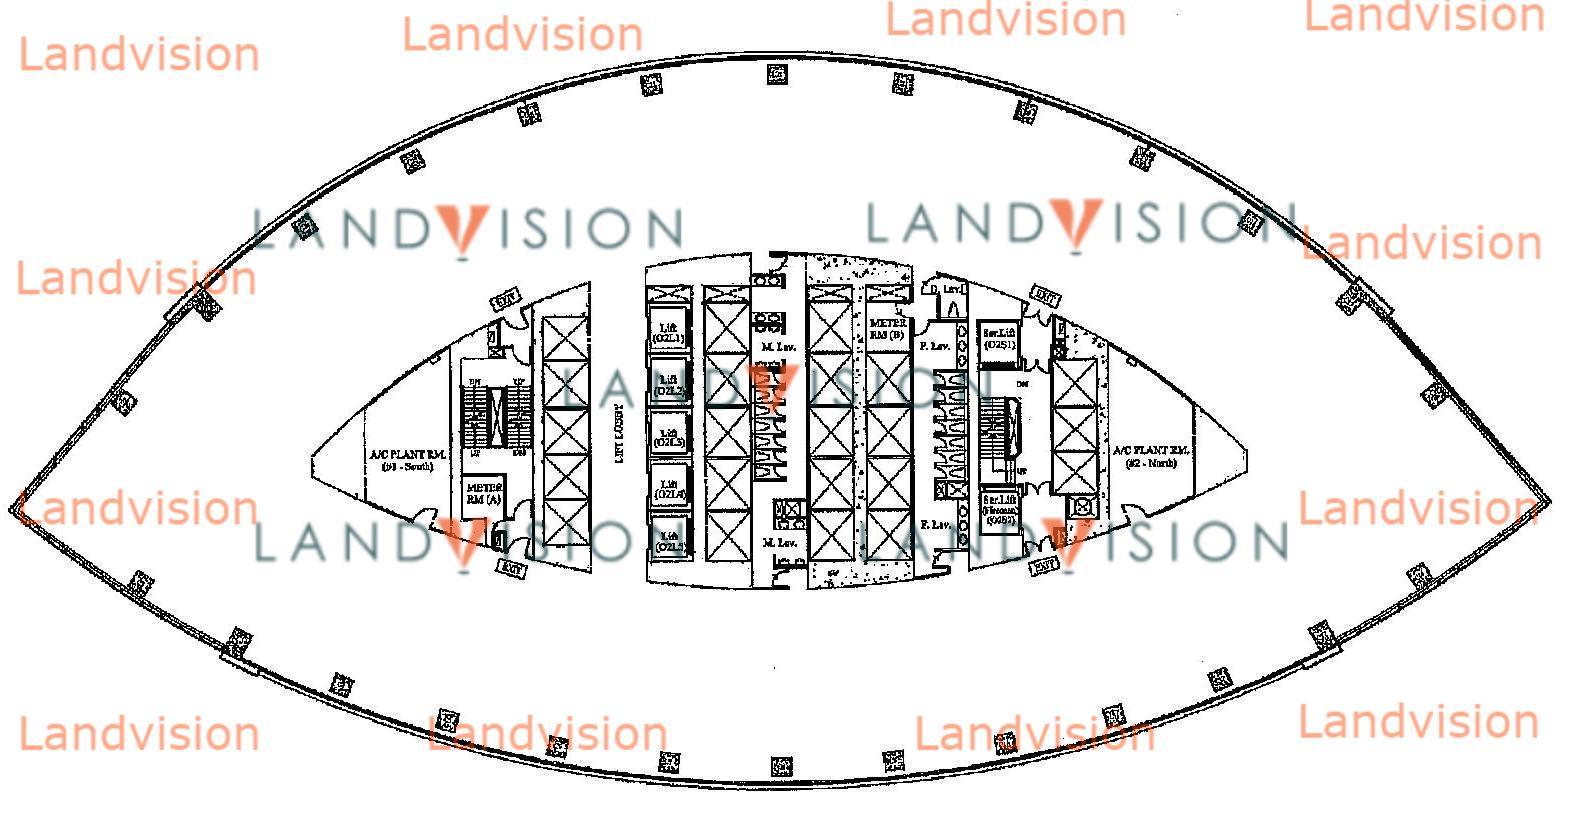 https://www.landvision.com.hk/wp-content/uploads/website/resize/floorplans/000188.JPG